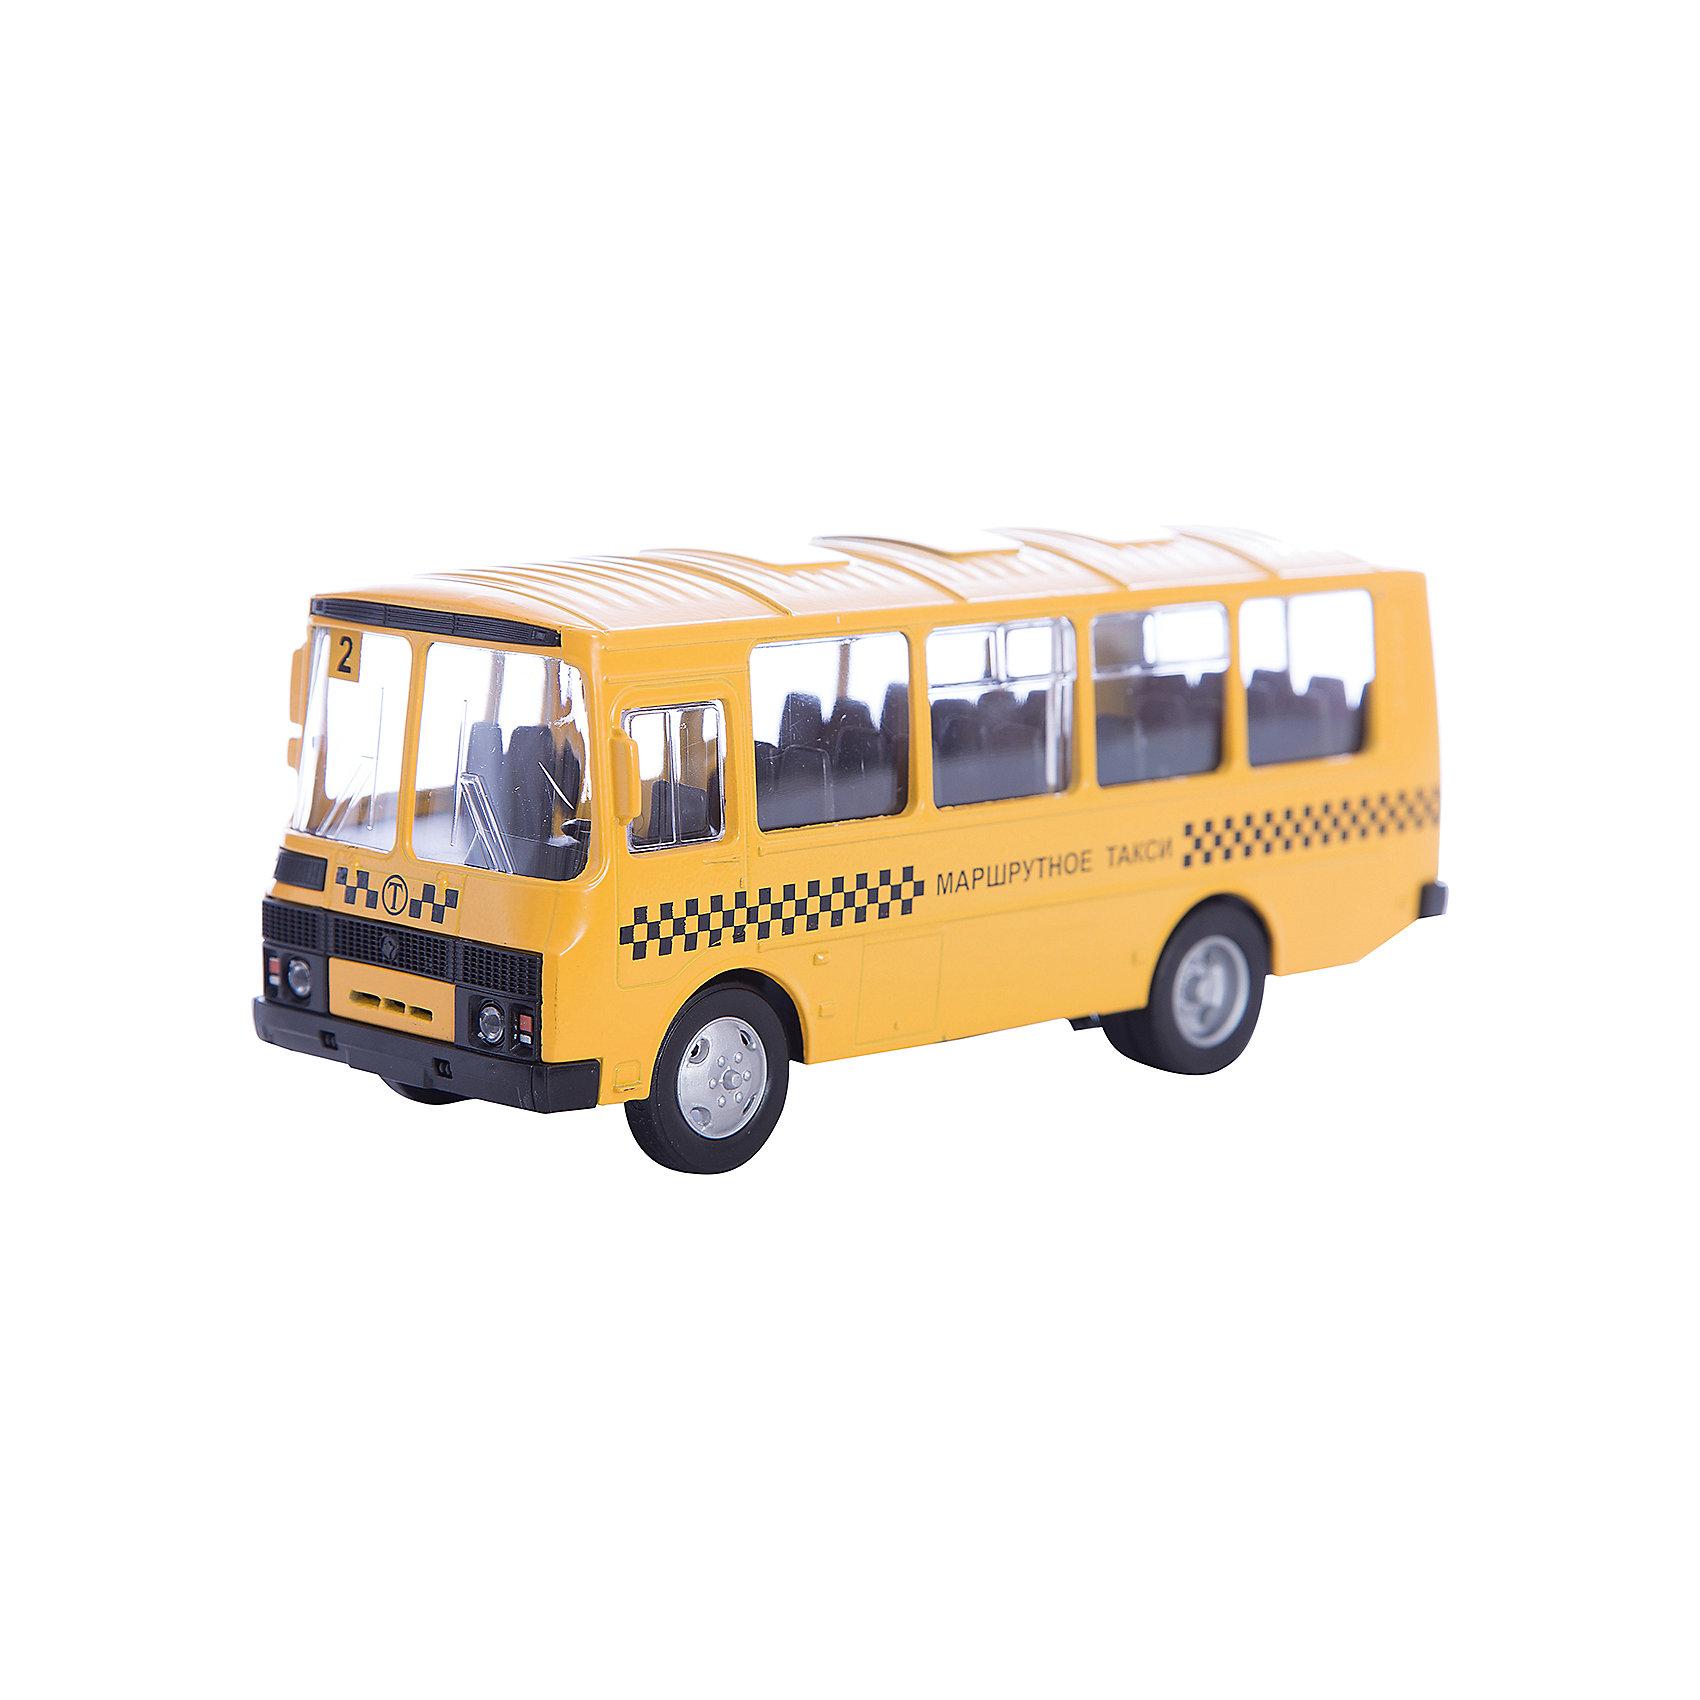 Машинка ПАЗ-32053 маршрутное такси 1:43, AutotimeМашинки<br><br><br>Ширина мм: 165<br>Глубина мм: 57<br>Высота мм: 75<br>Вес г: 13<br>Возраст от месяцев: 36<br>Возраст до месяцев: 2147483647<br>Пол: Мужской<br>Возраст: Детский<br>SKU: 5583991